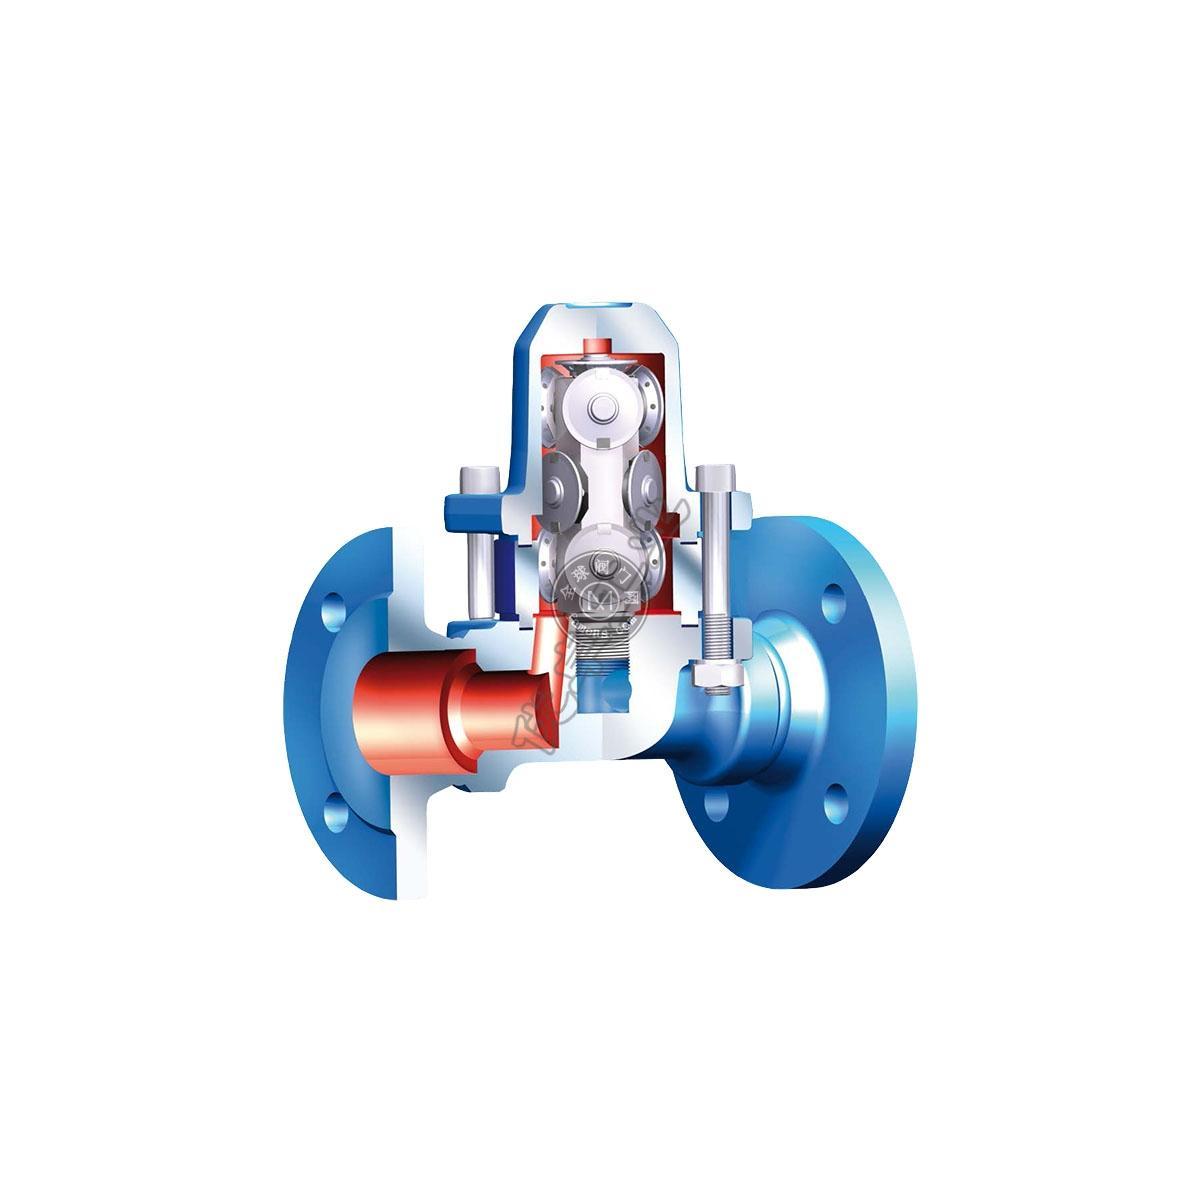 CONA M 用于蒸汽系统在不同冷凝水背压下工况的膜盒式热静力疏水阀